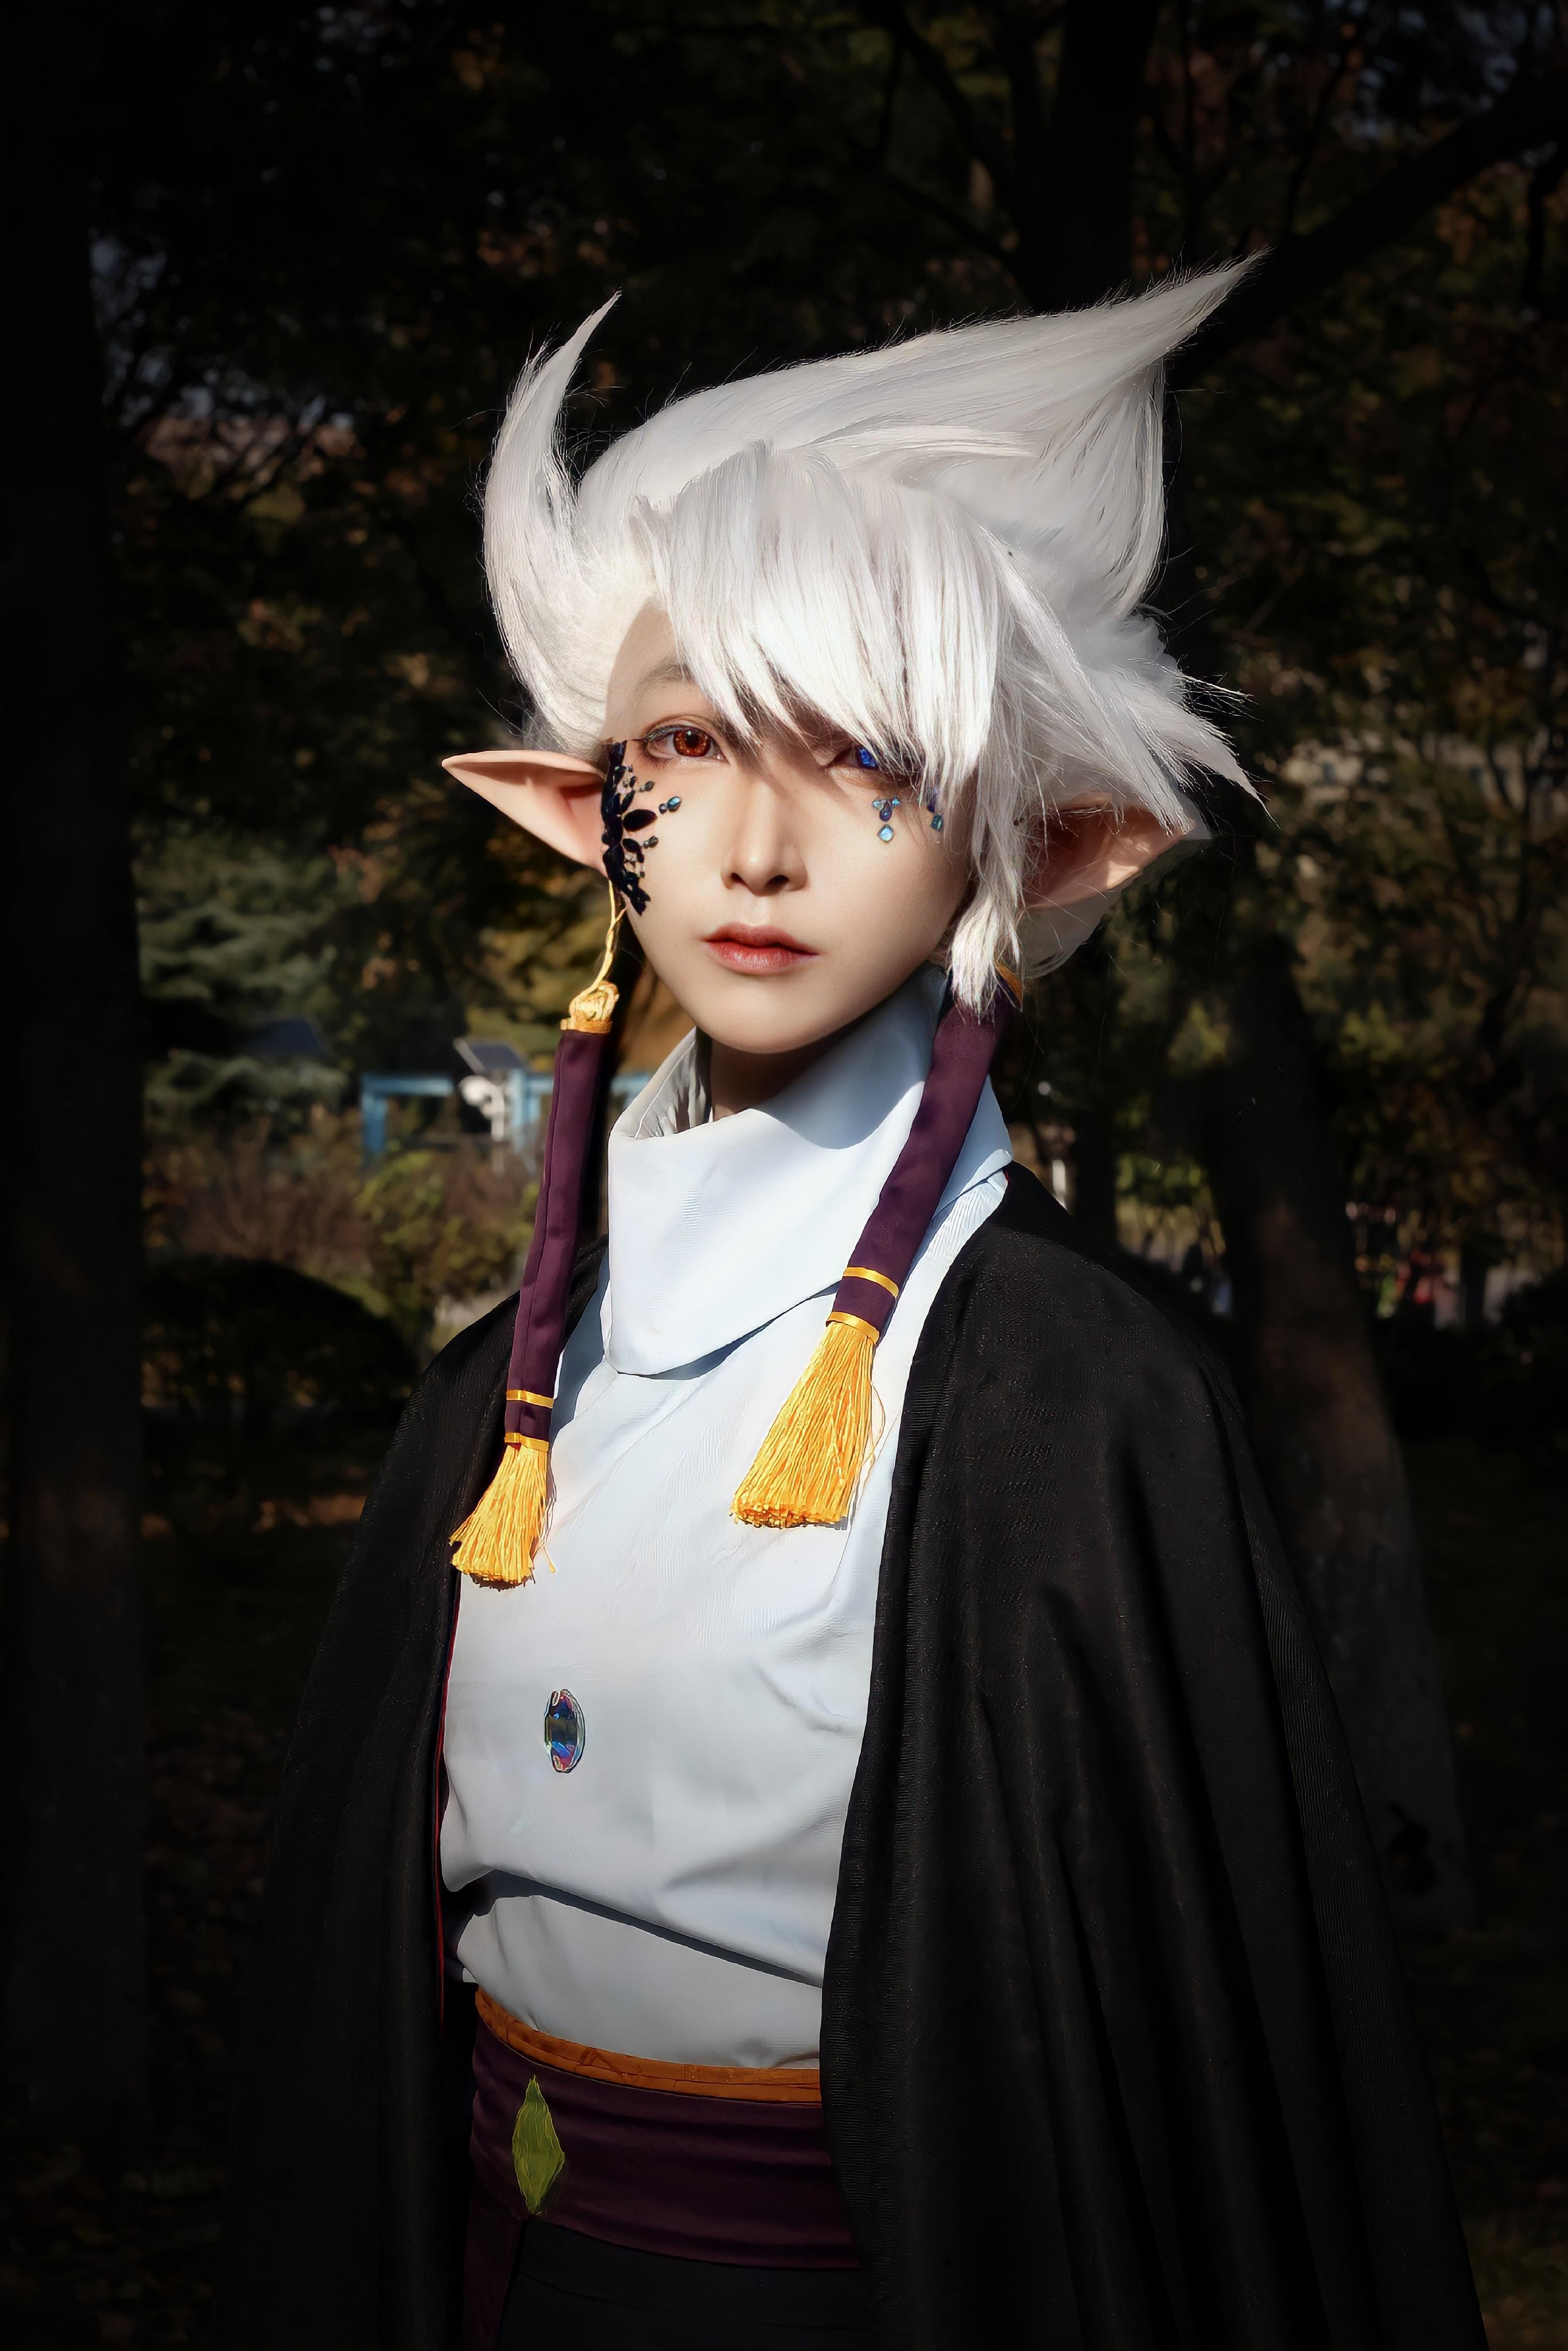 《SKY光遇》正片cosplay【CN:君祭酒】-第3张